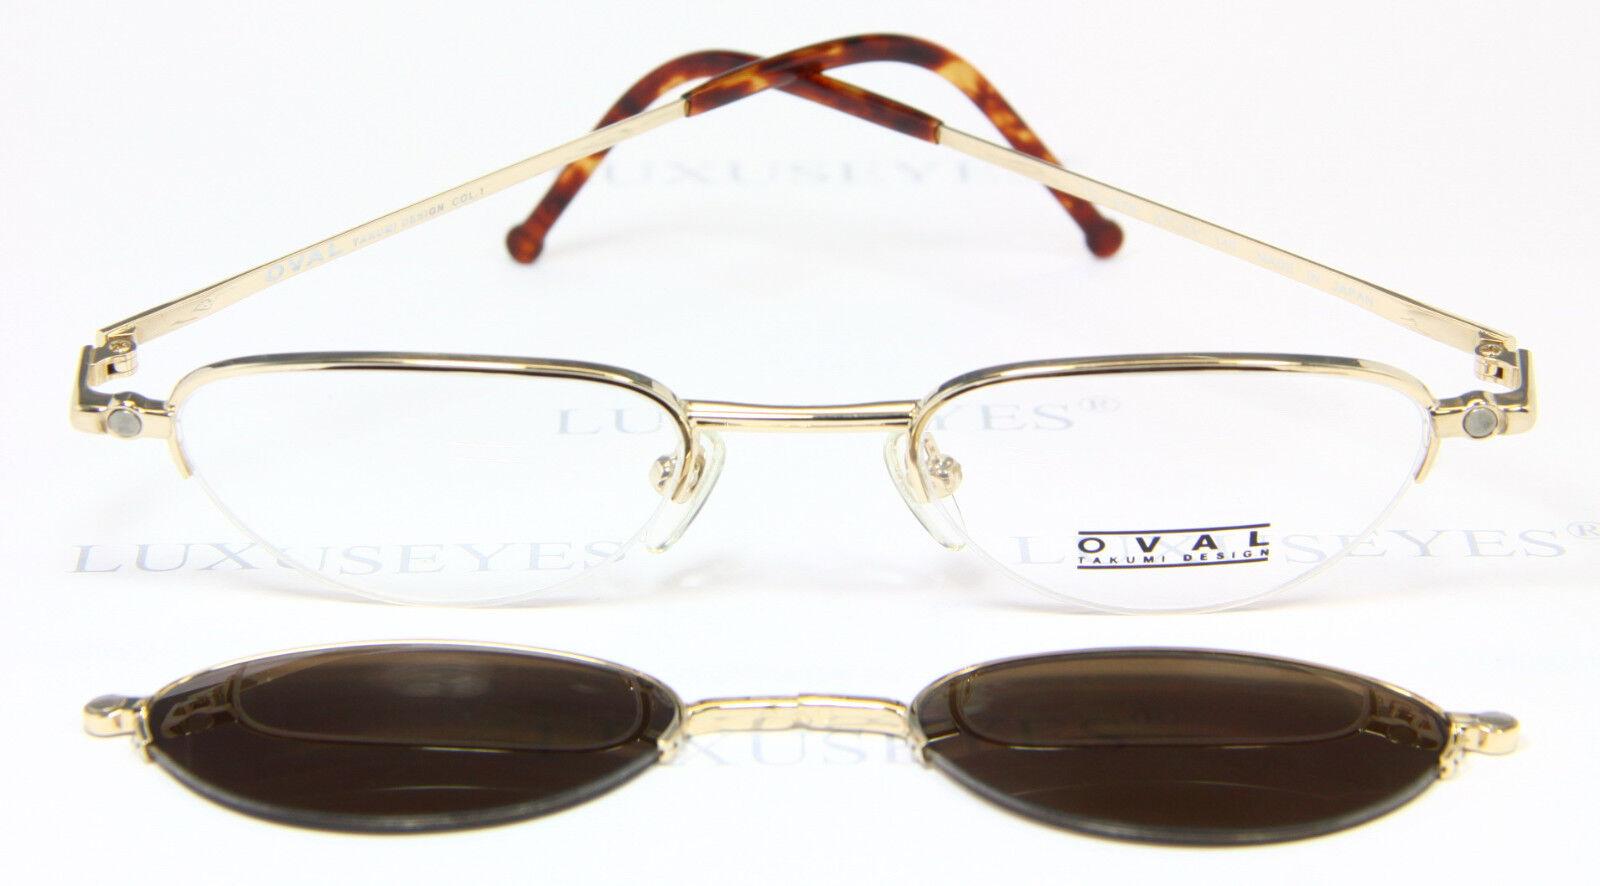 TAKUMI OVAL Brille Eyeglasses Occhiali Gafas TO-578 Sun Clip Rare ...